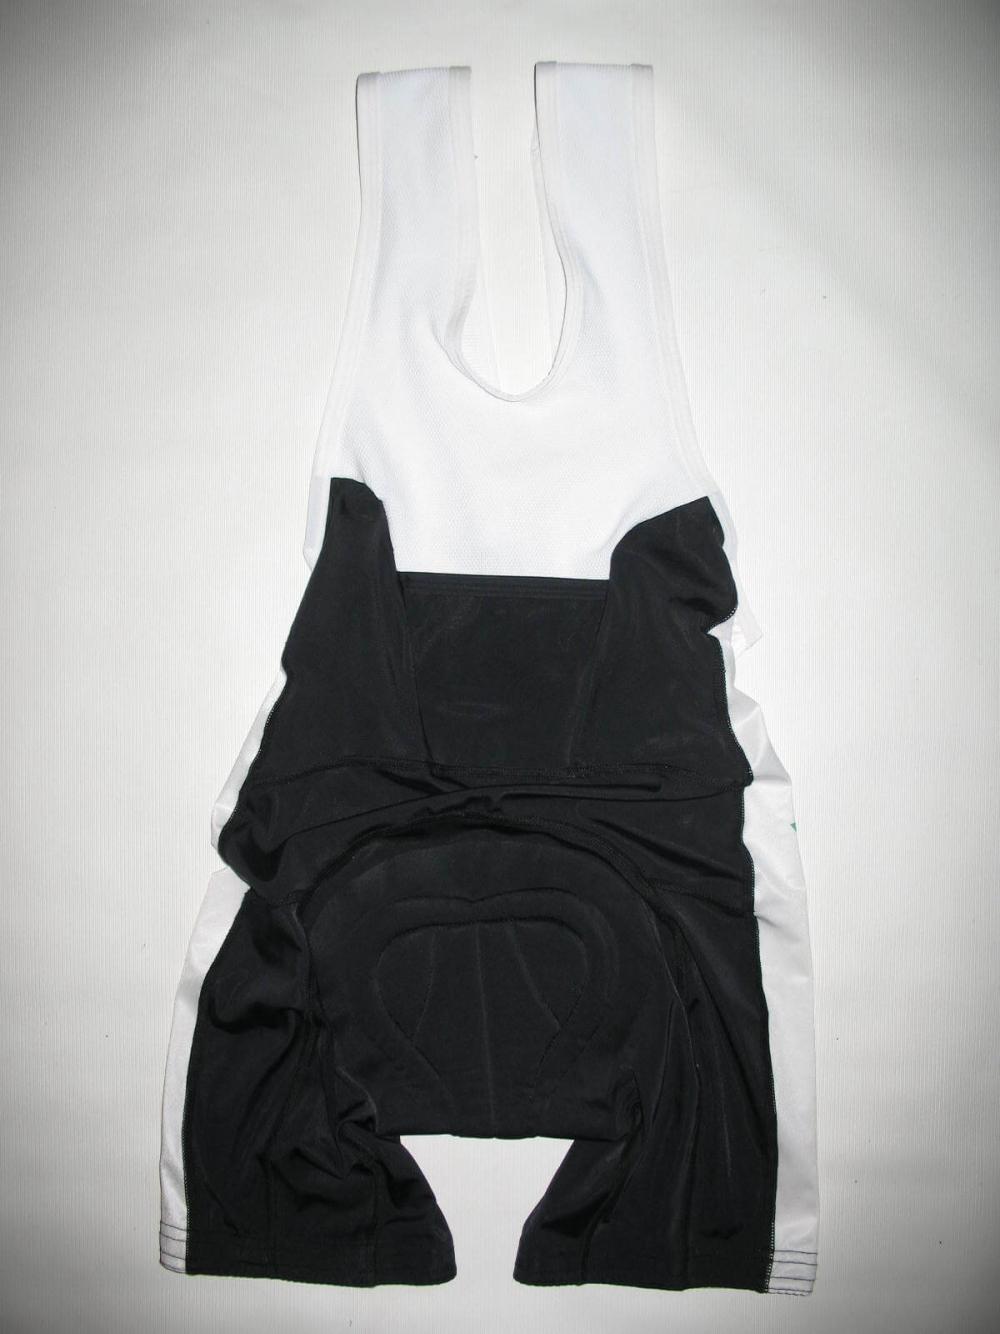 Велошорты SMS SANTINI creabeton bib shorts (размер S) - 2